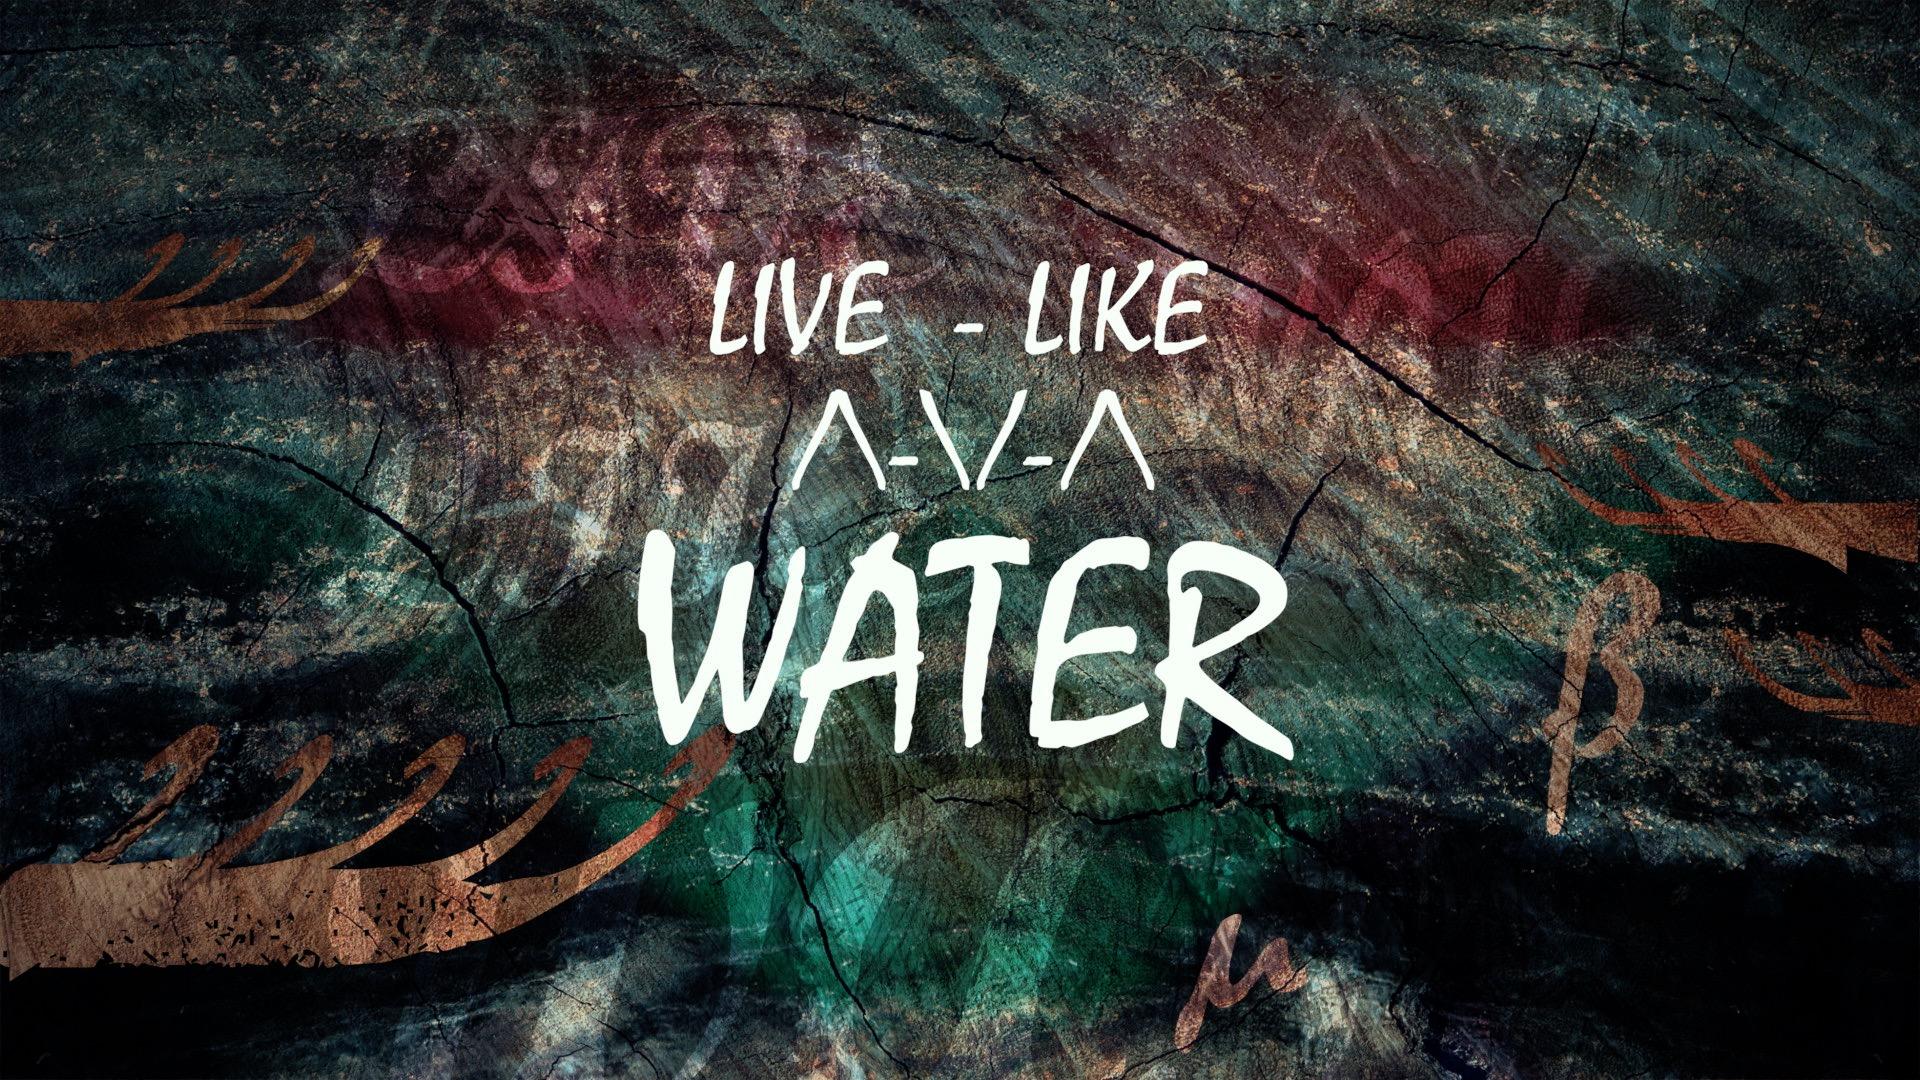 Live Like Water